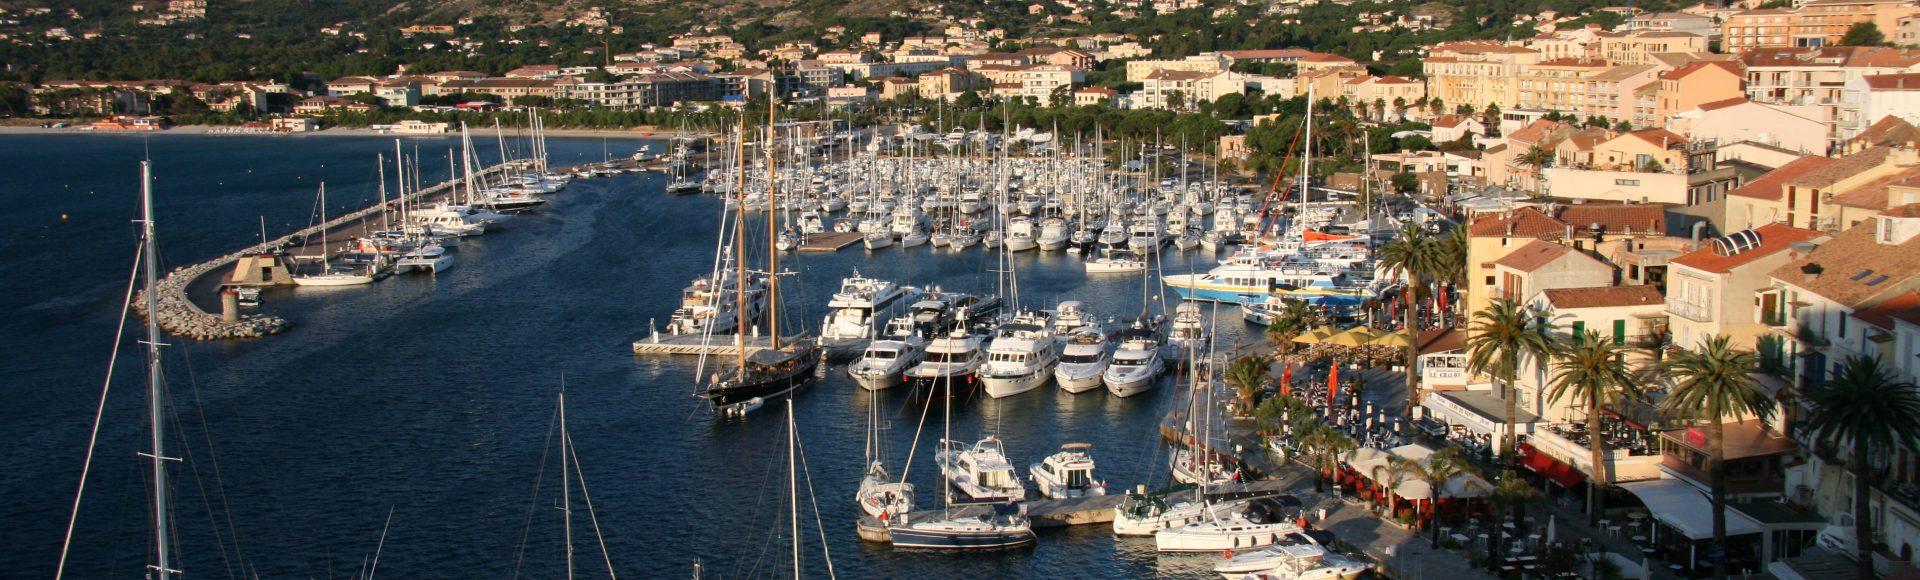 Corsica, Island Paradise in the Mediterranean